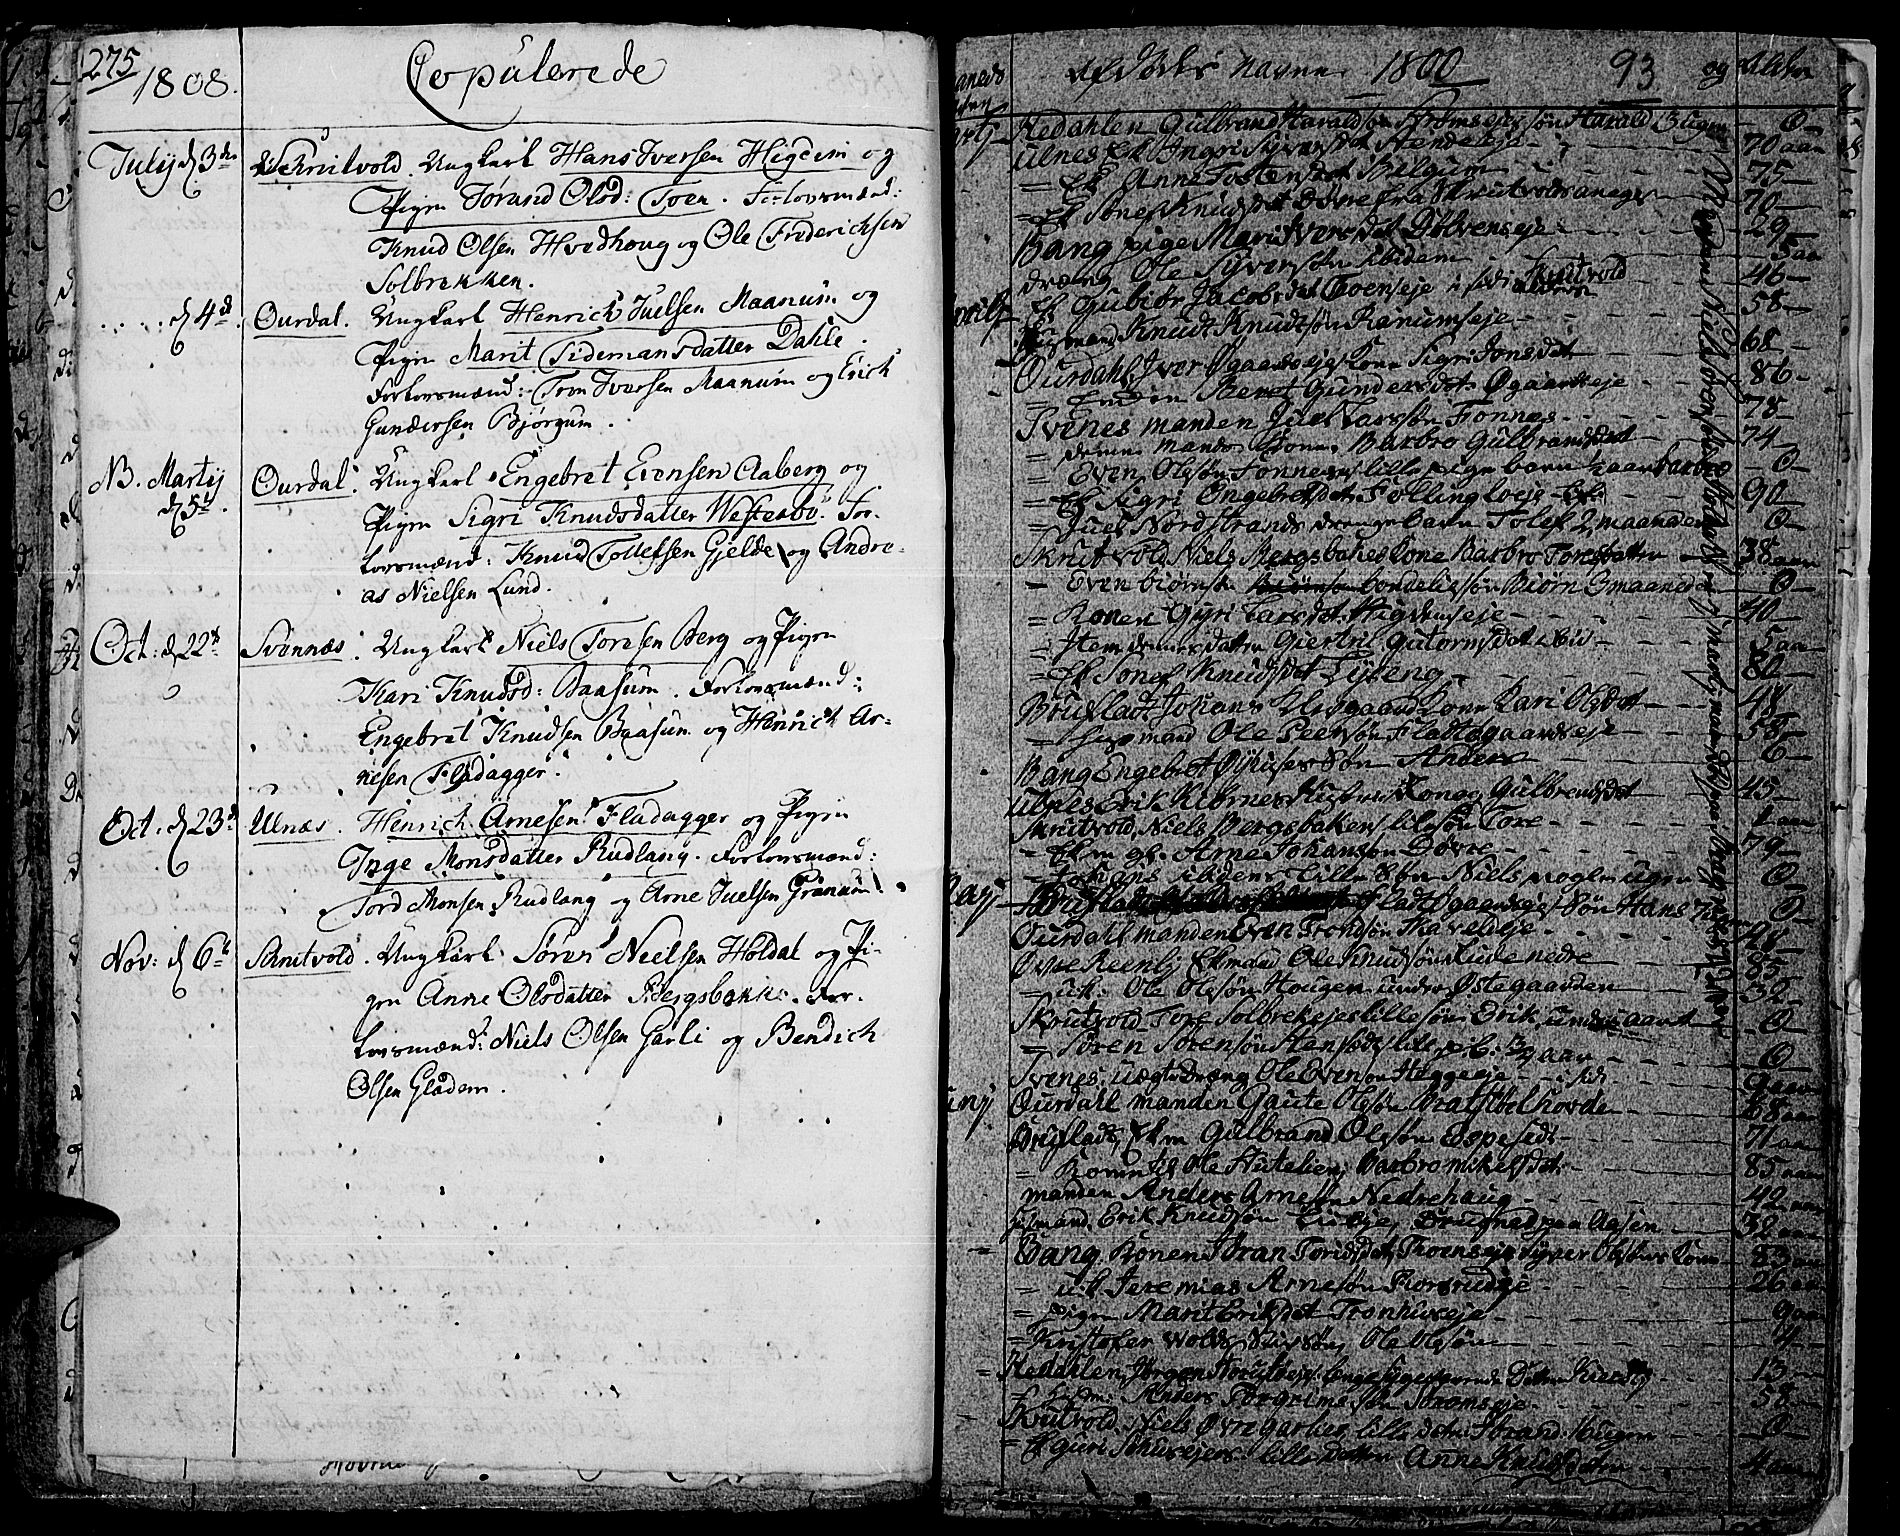 SAH, Aurdal prestekontor, Ministerialbok nr. 7, 1800-1808, s. 93